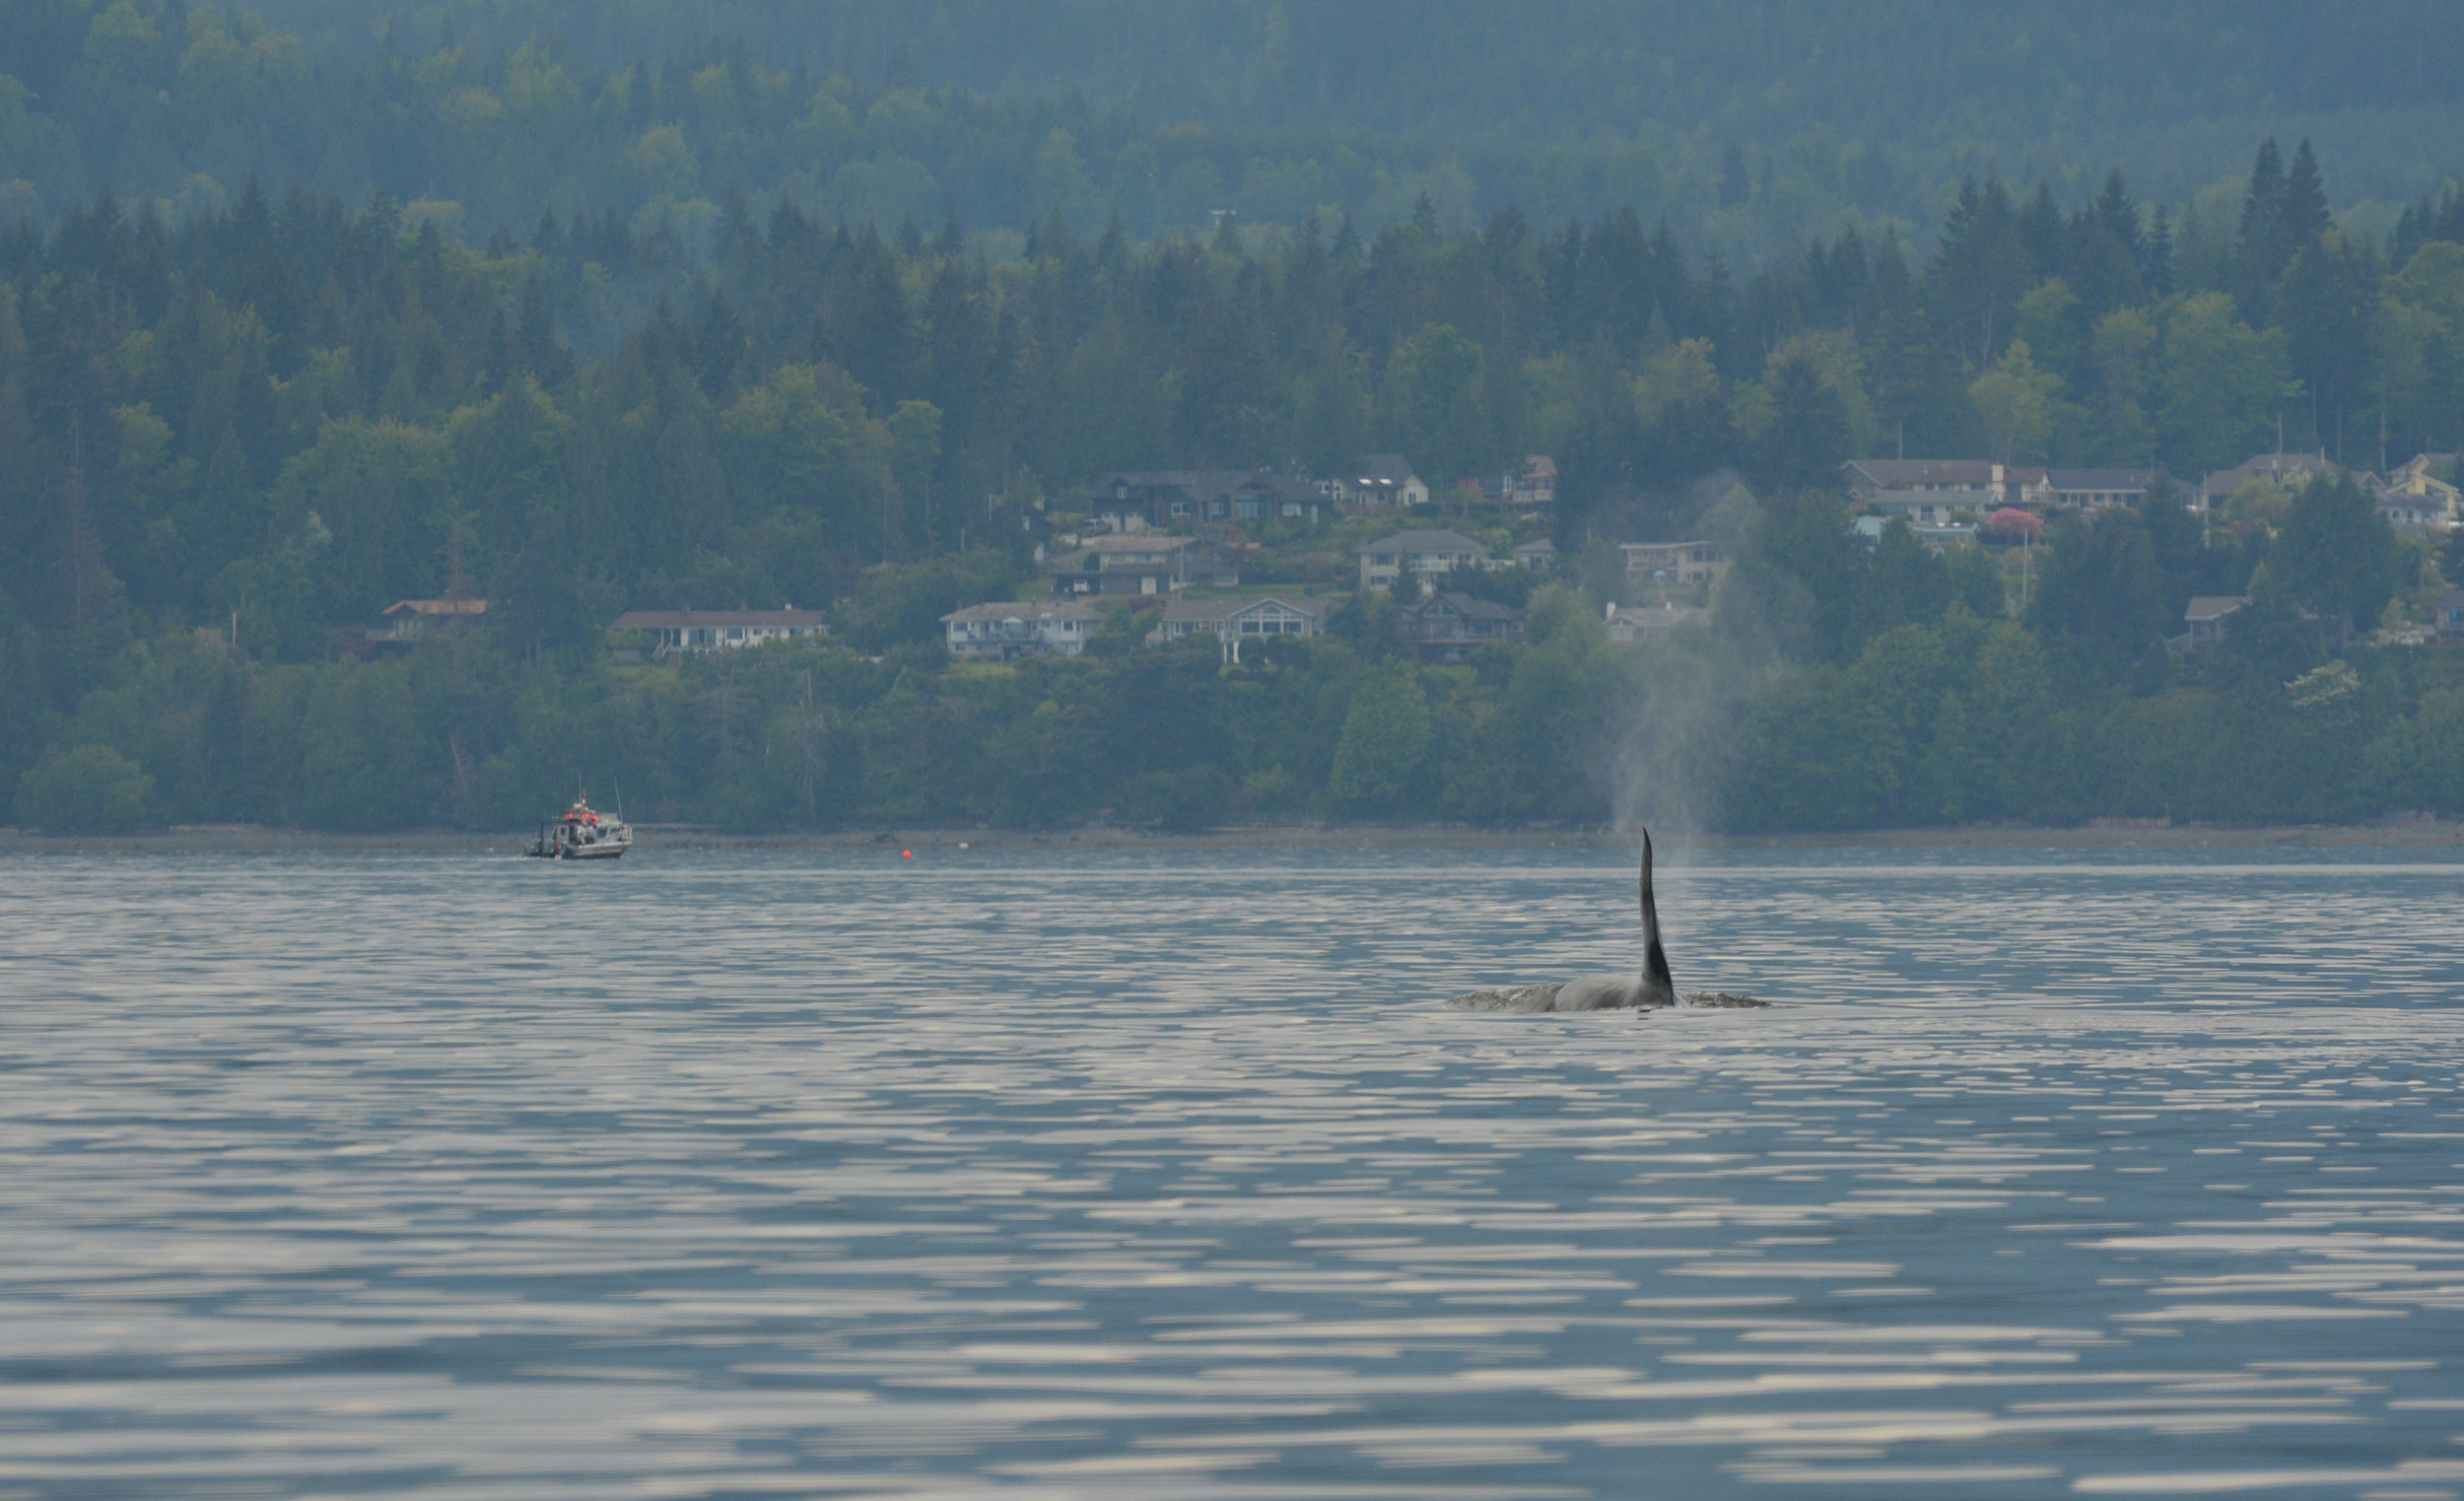 T19C was born in 2001. That fin might get even bigger! Photo by Alanna Vivani